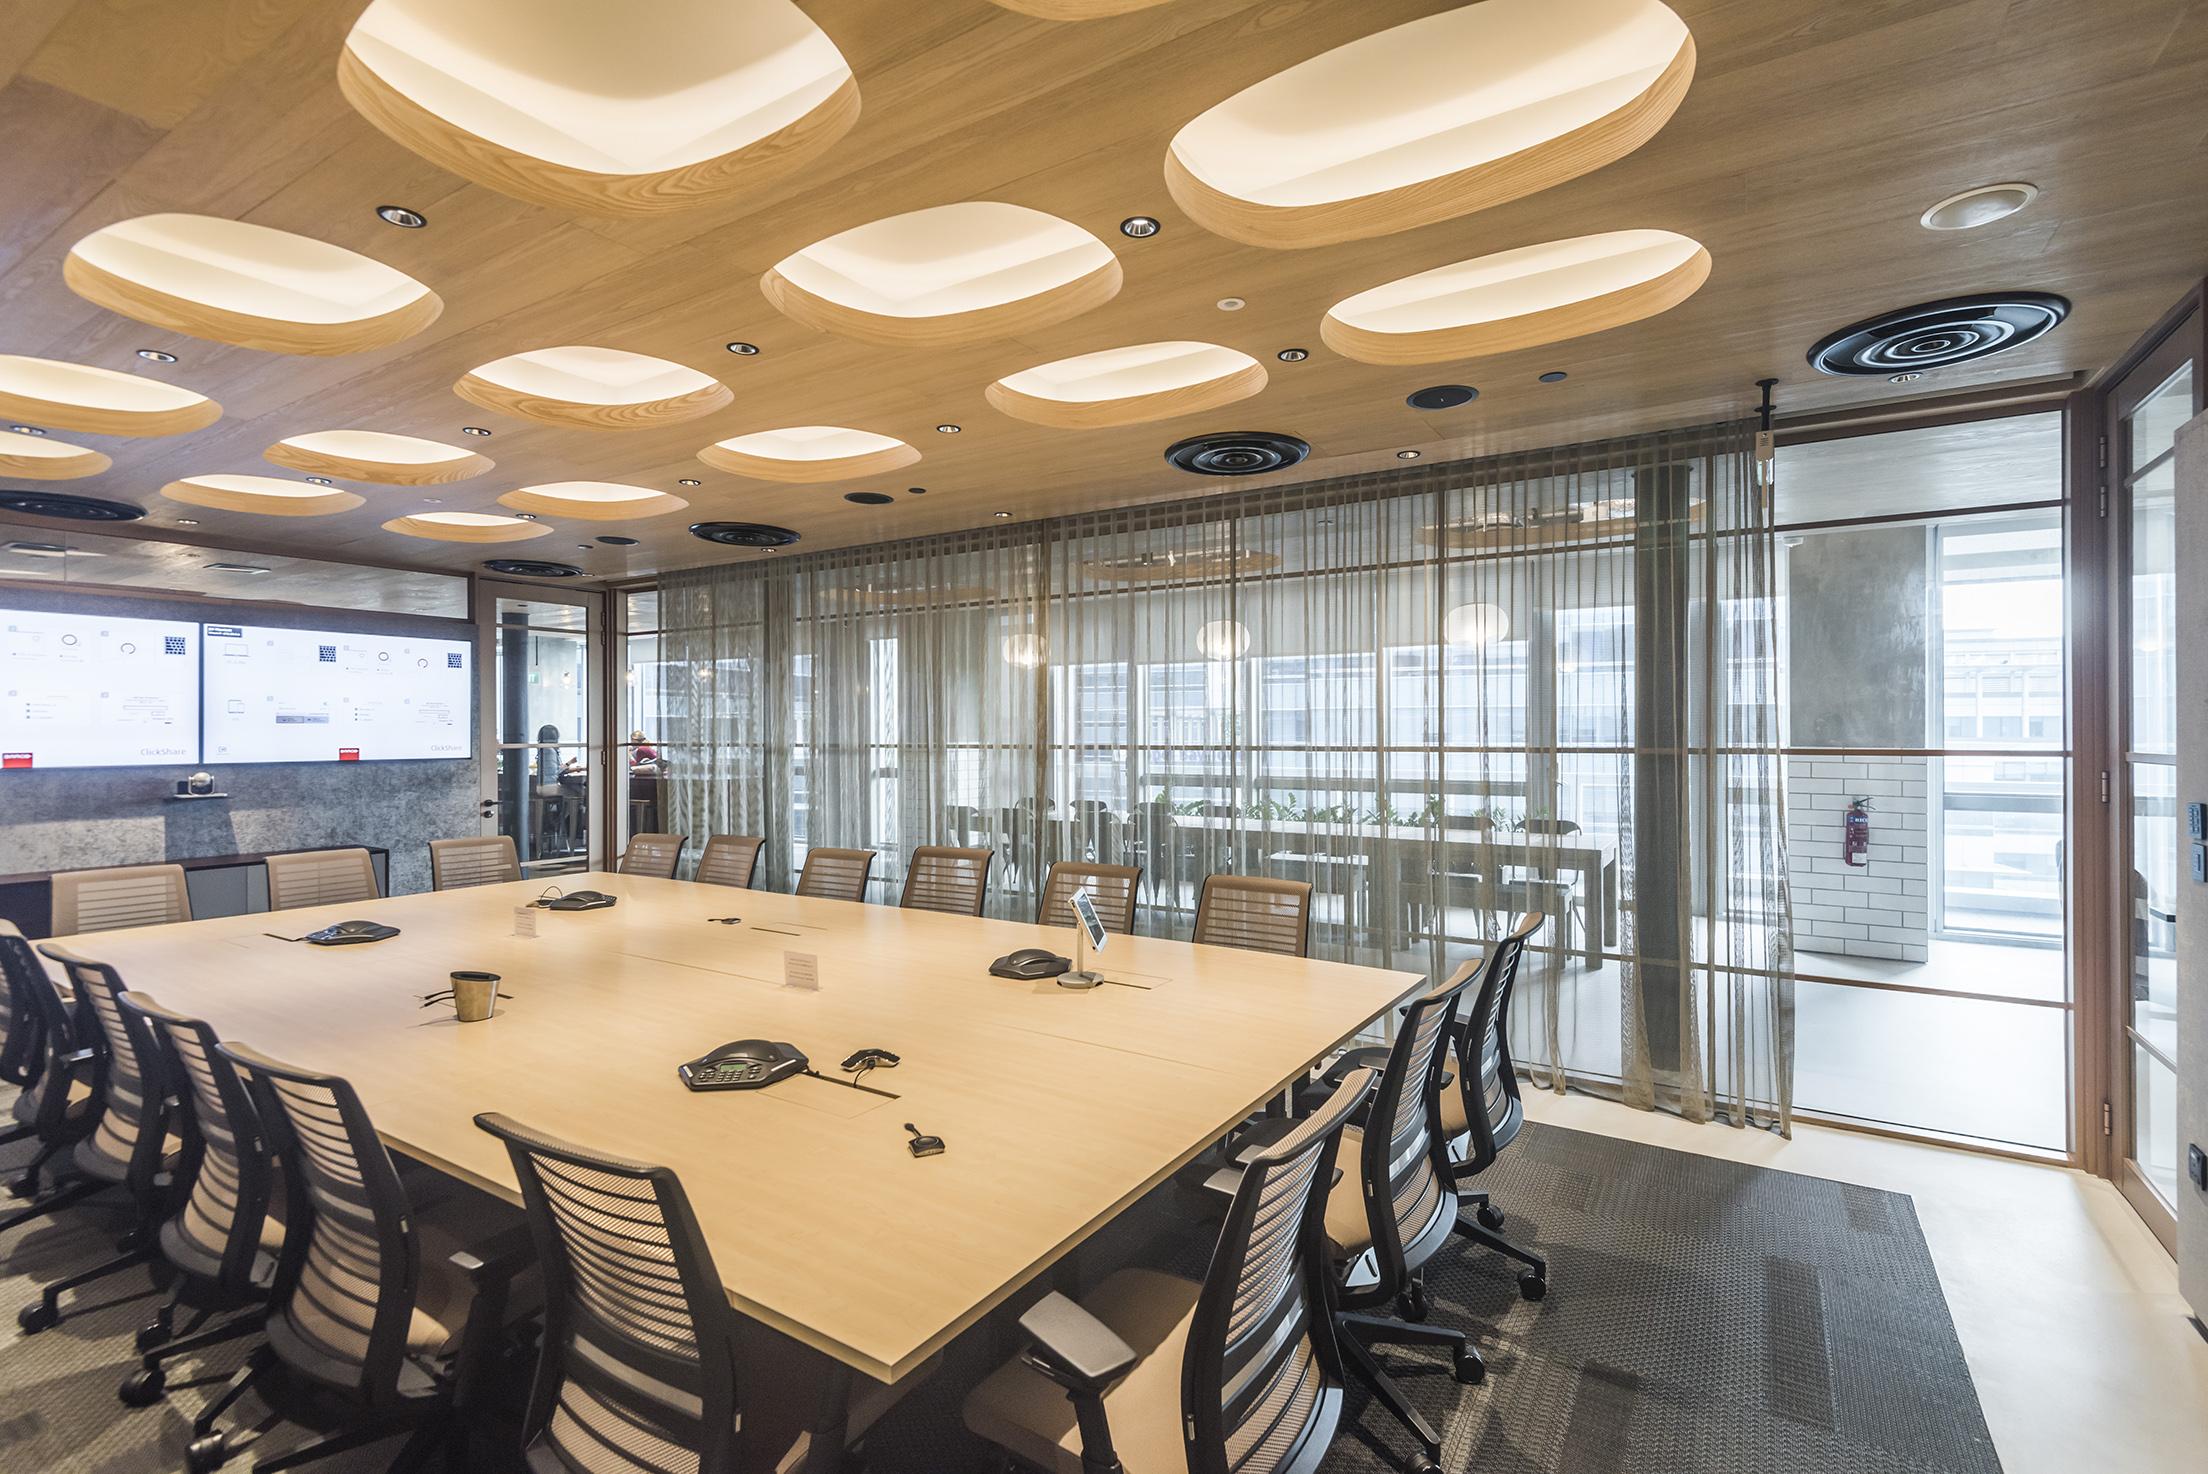 JEB-partitions-summit-integra-circa ia-Marriott-singapore-workspace-03.jpg